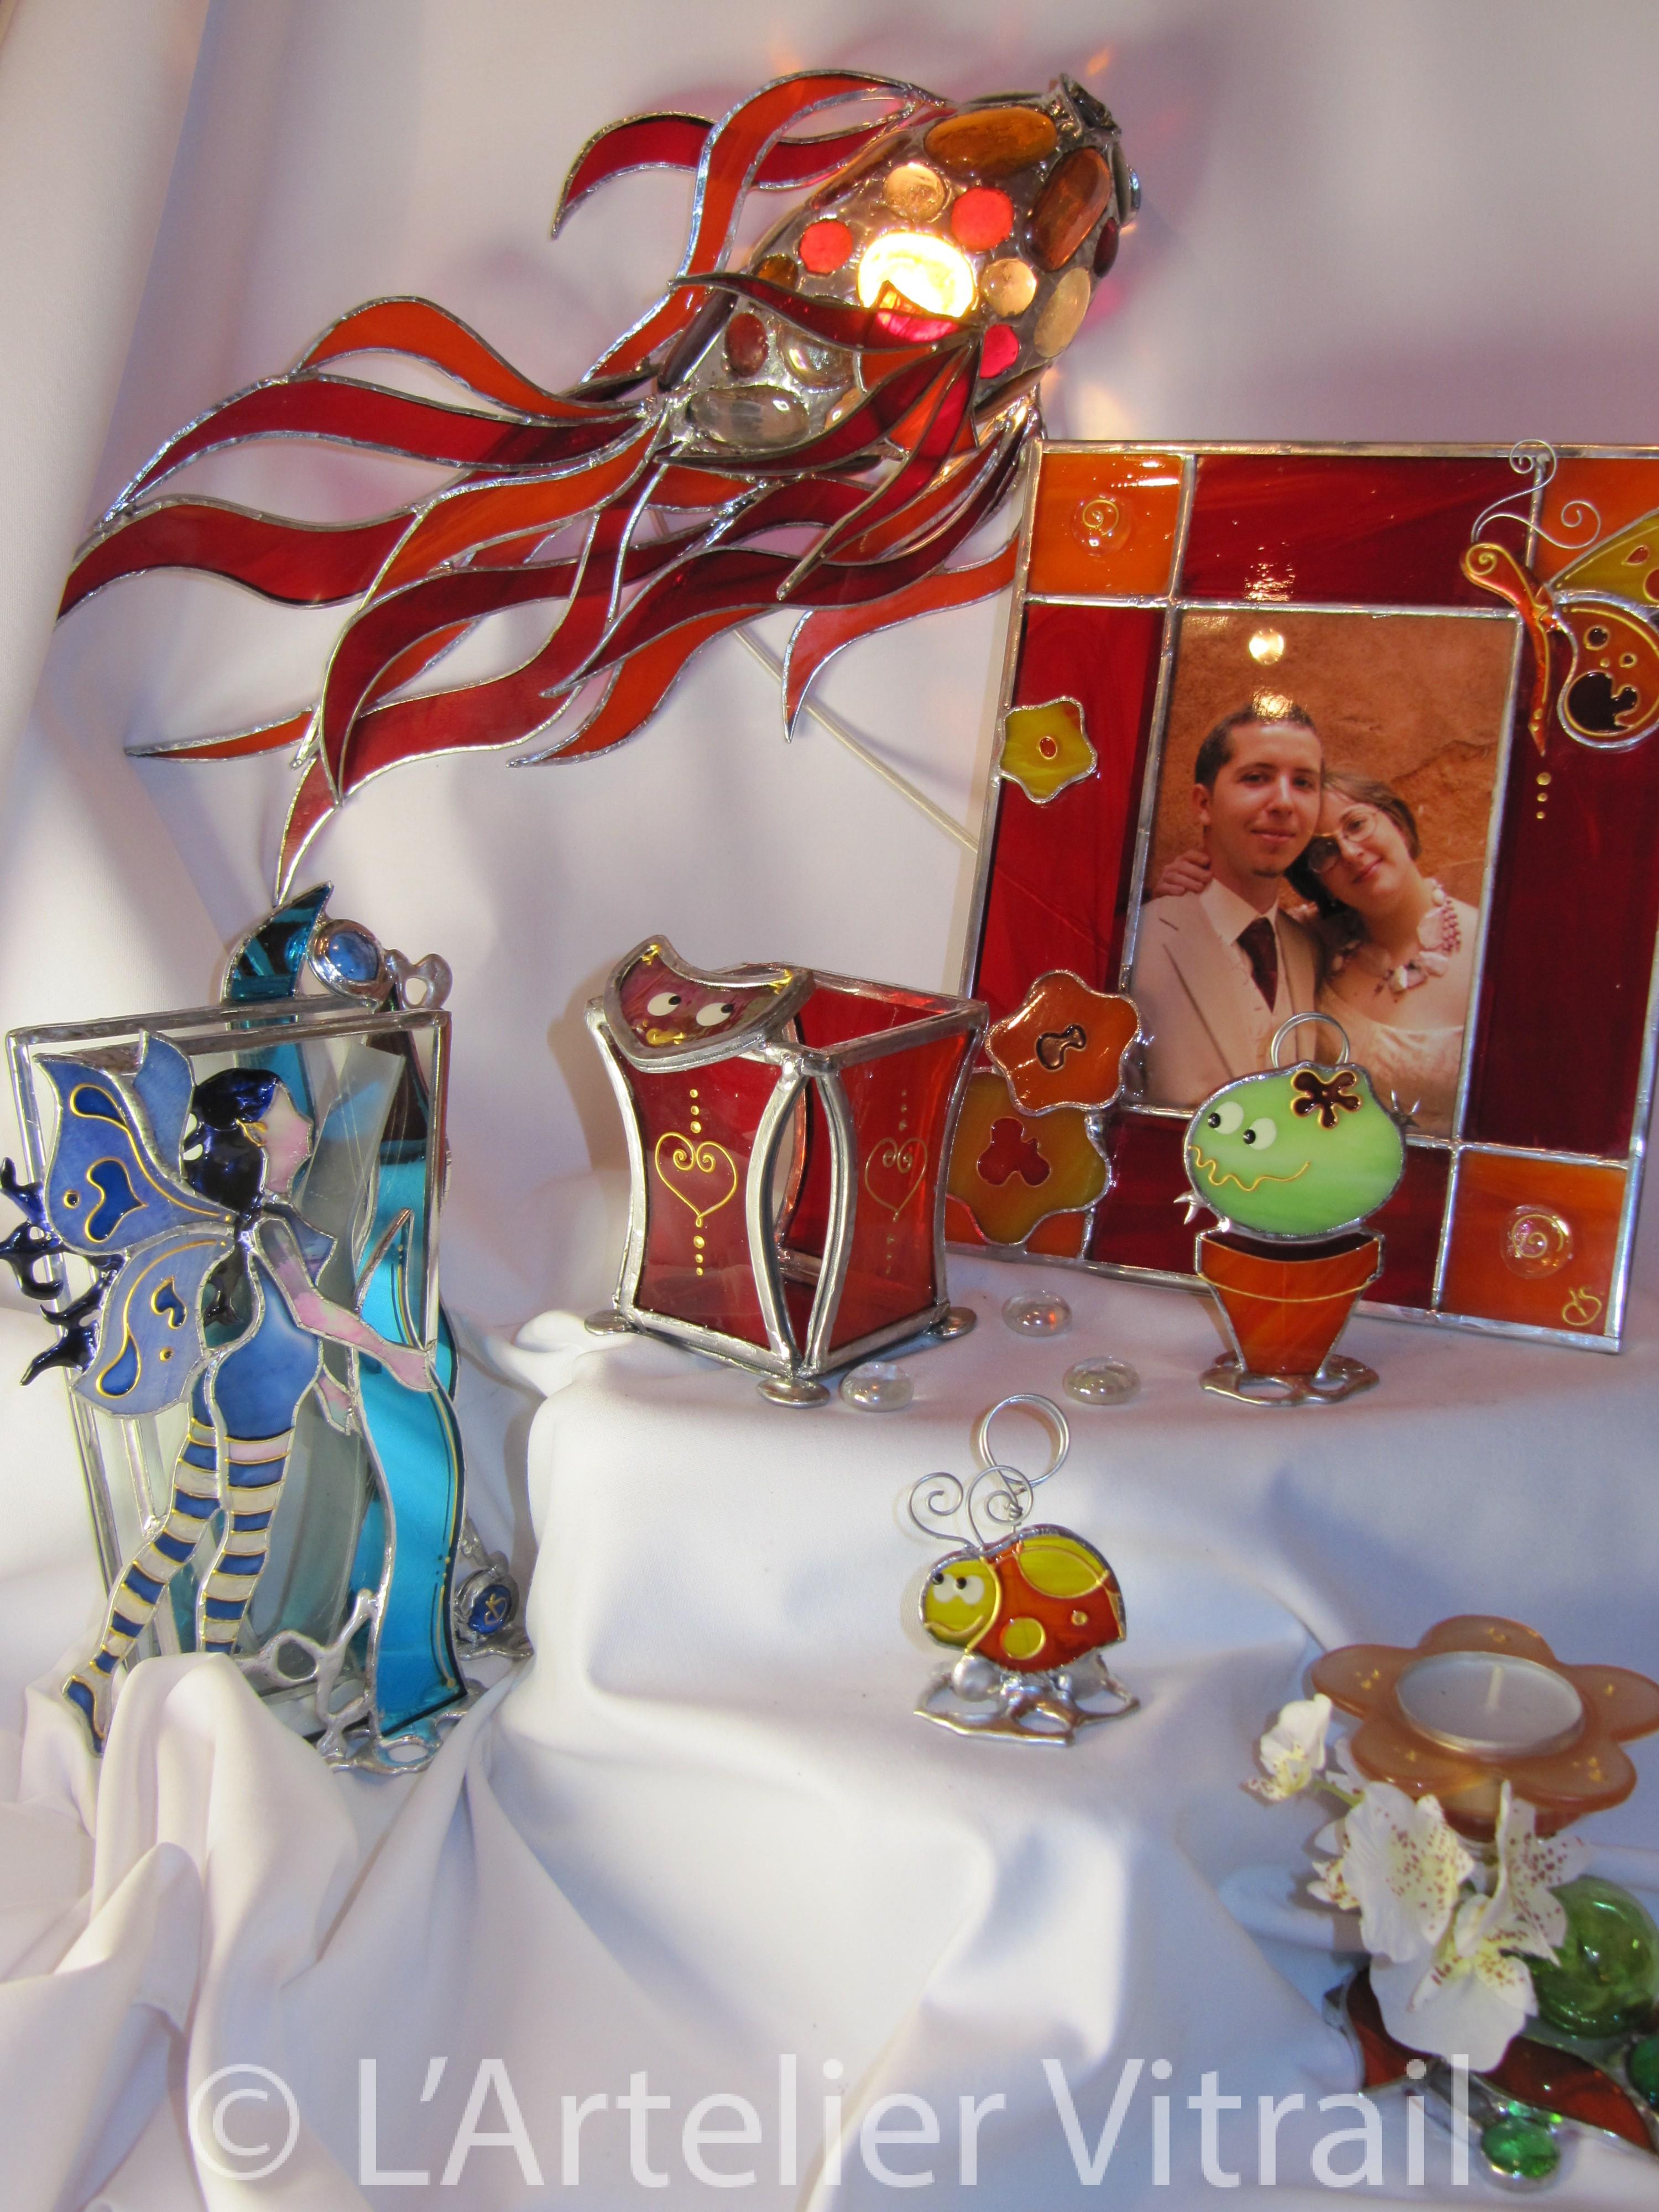 D corations objets l 39 art elier vitraill 39 art elier vitrail for Vitrail decoration